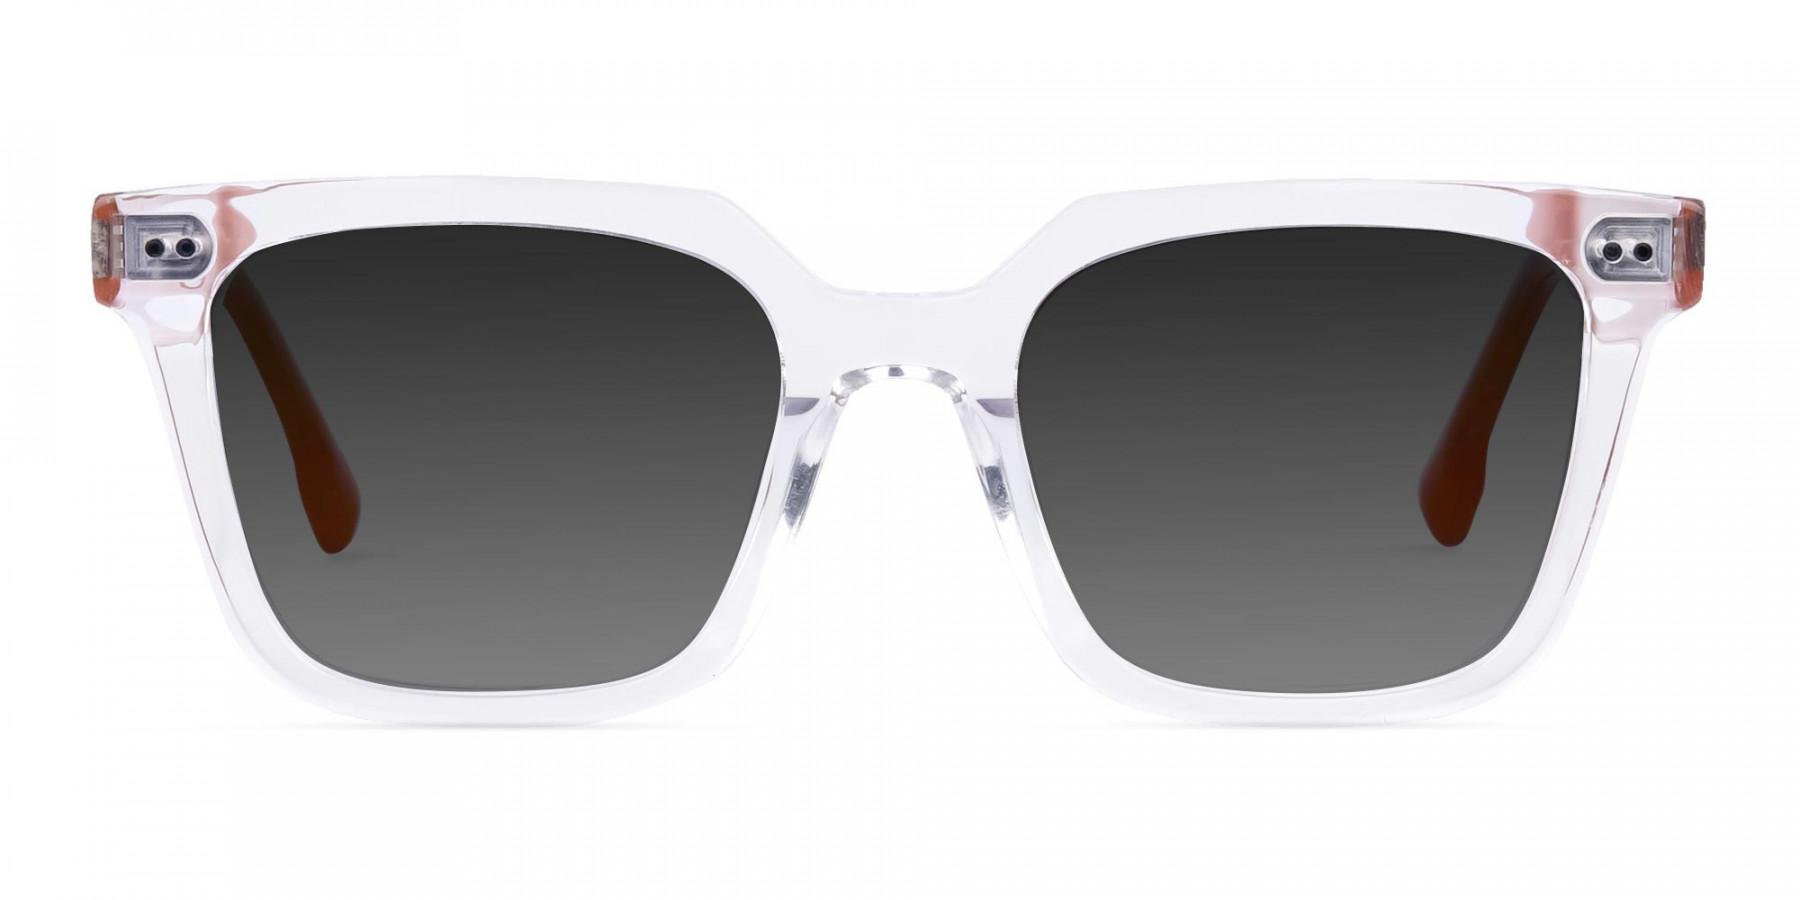 Clear-Wayfarer-Sunglasses-with-Grey-Tint-3